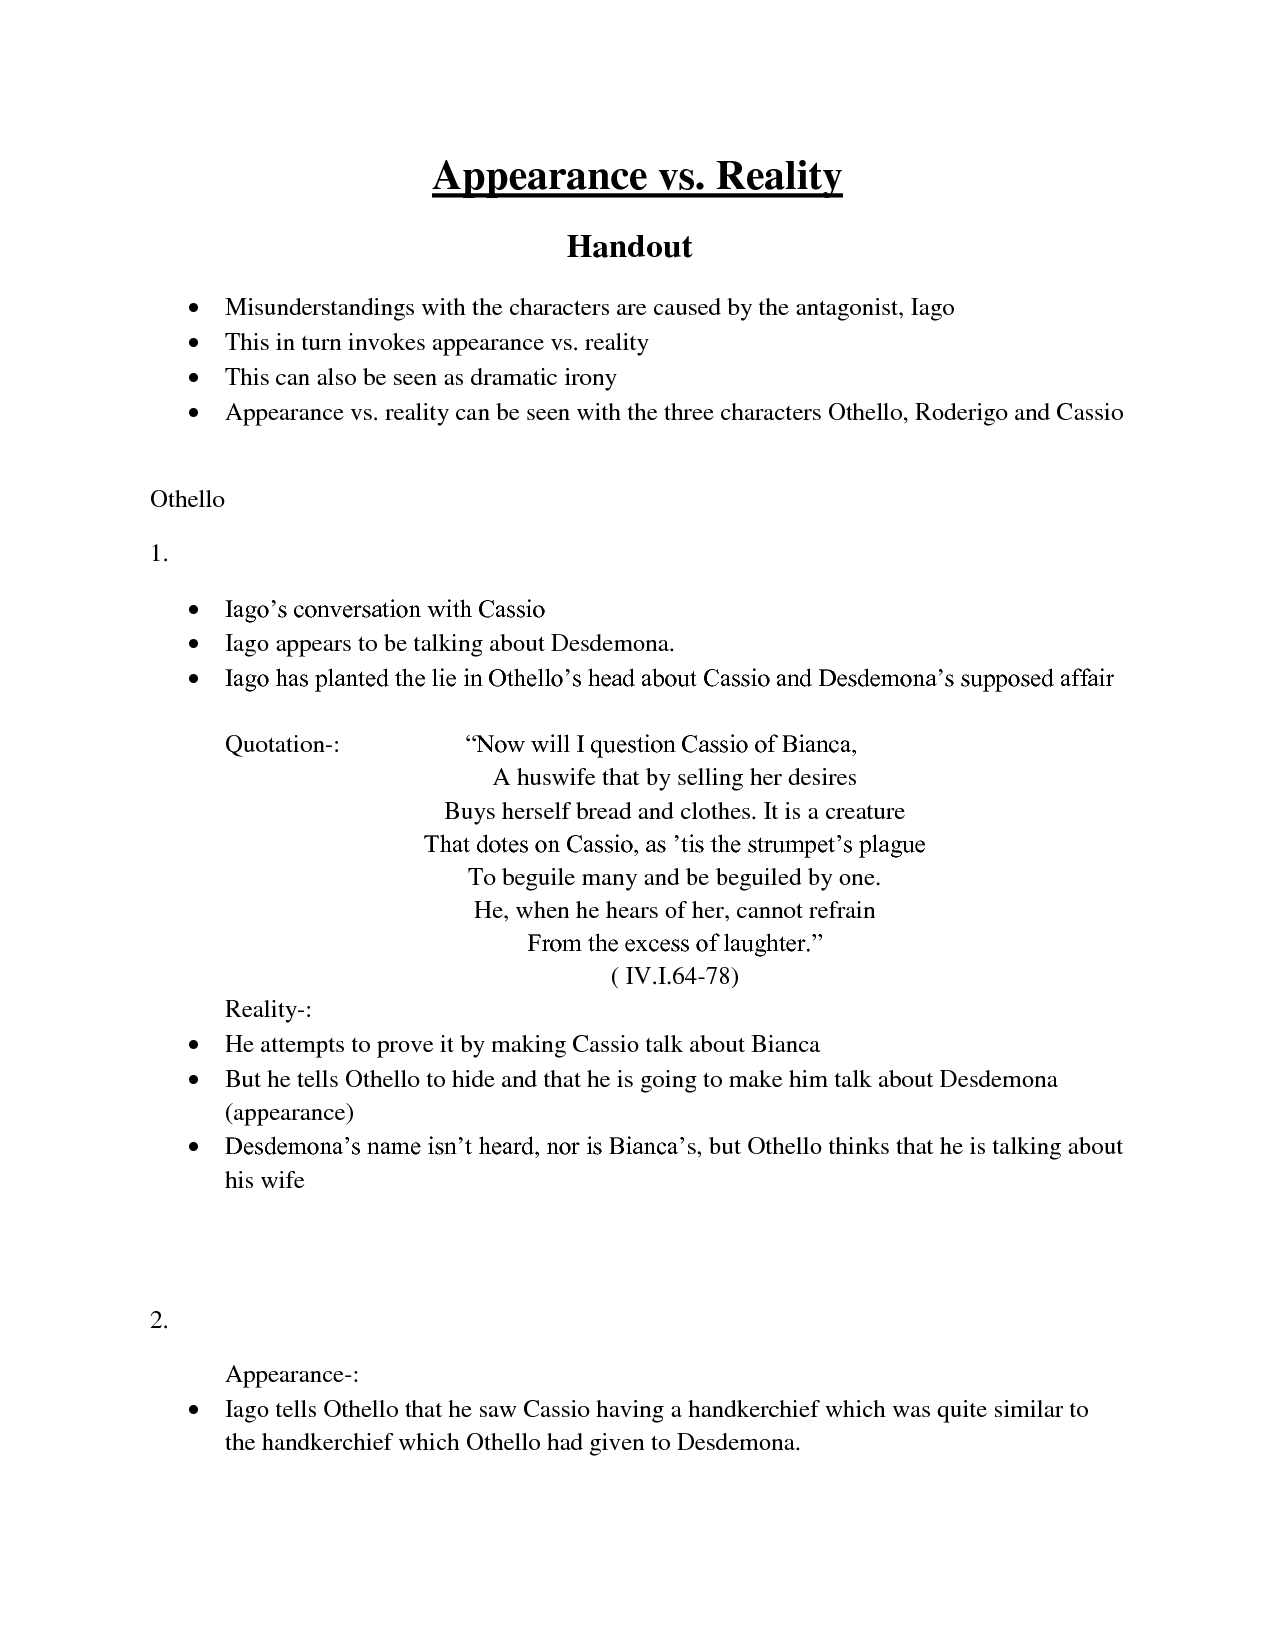 East carolina university application essay